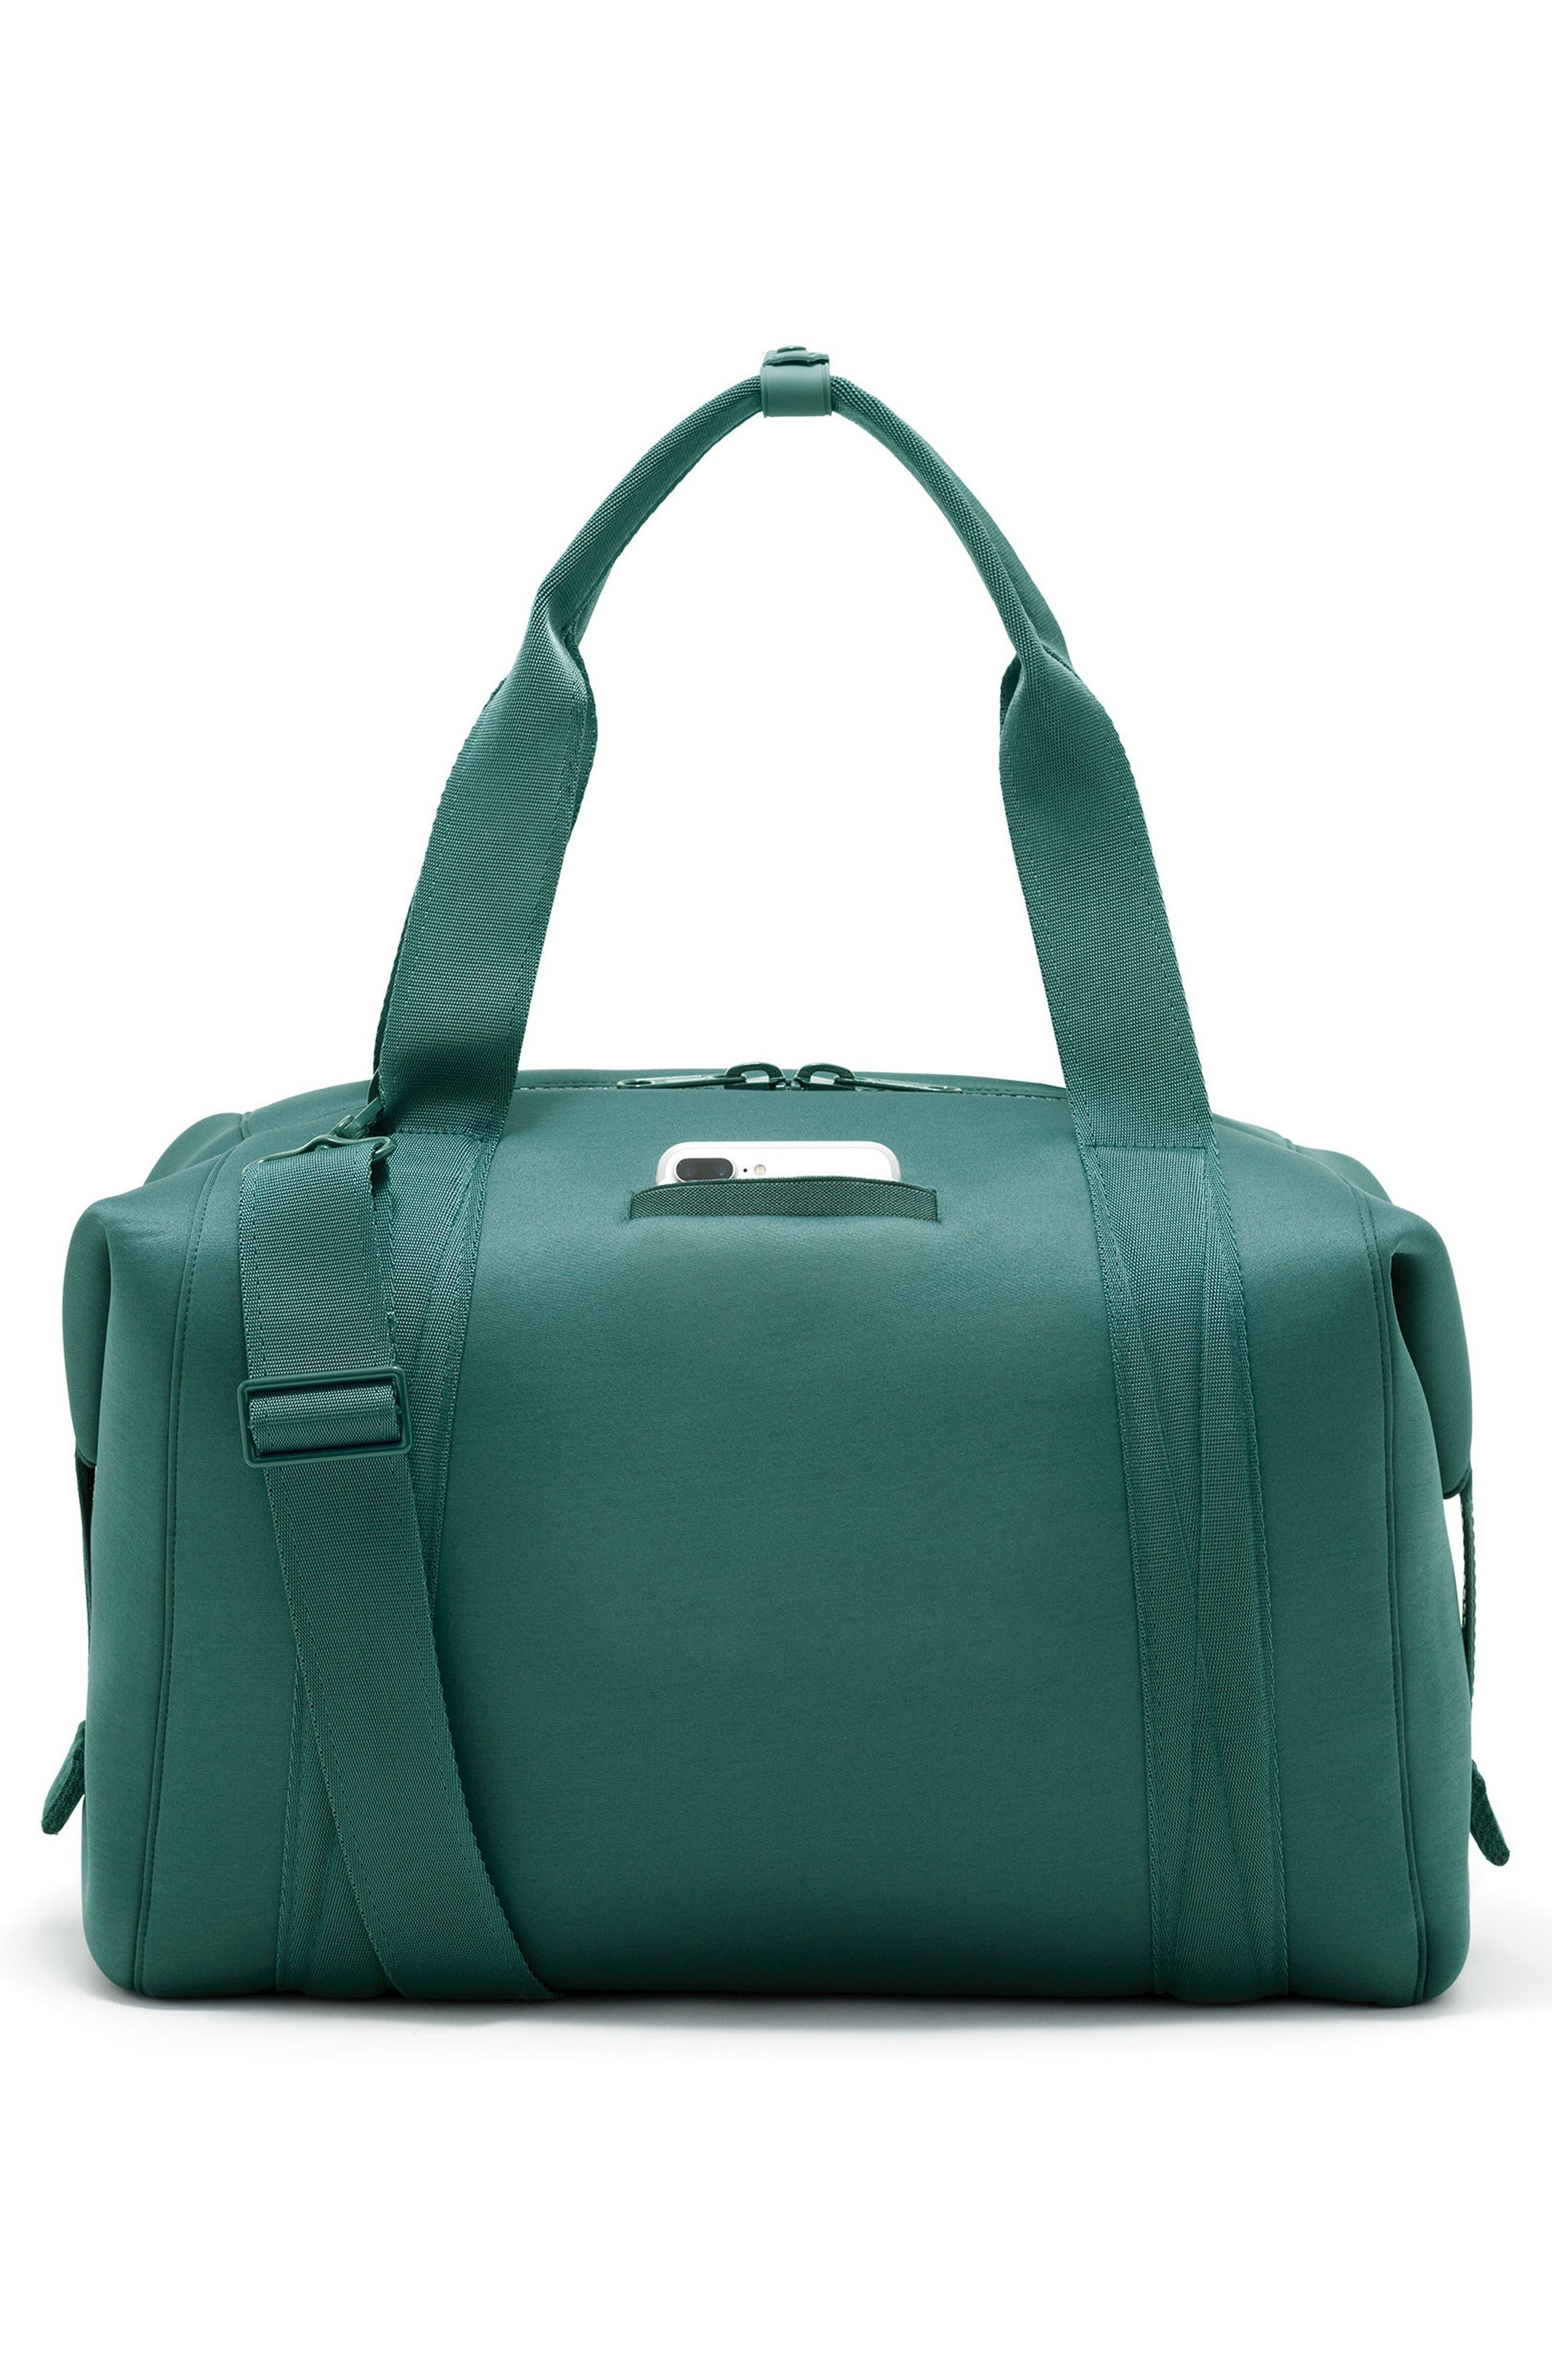 365 Large Landon Neoprene Carryall Duffel Bag,                             Alternate thumbnail 33, color,